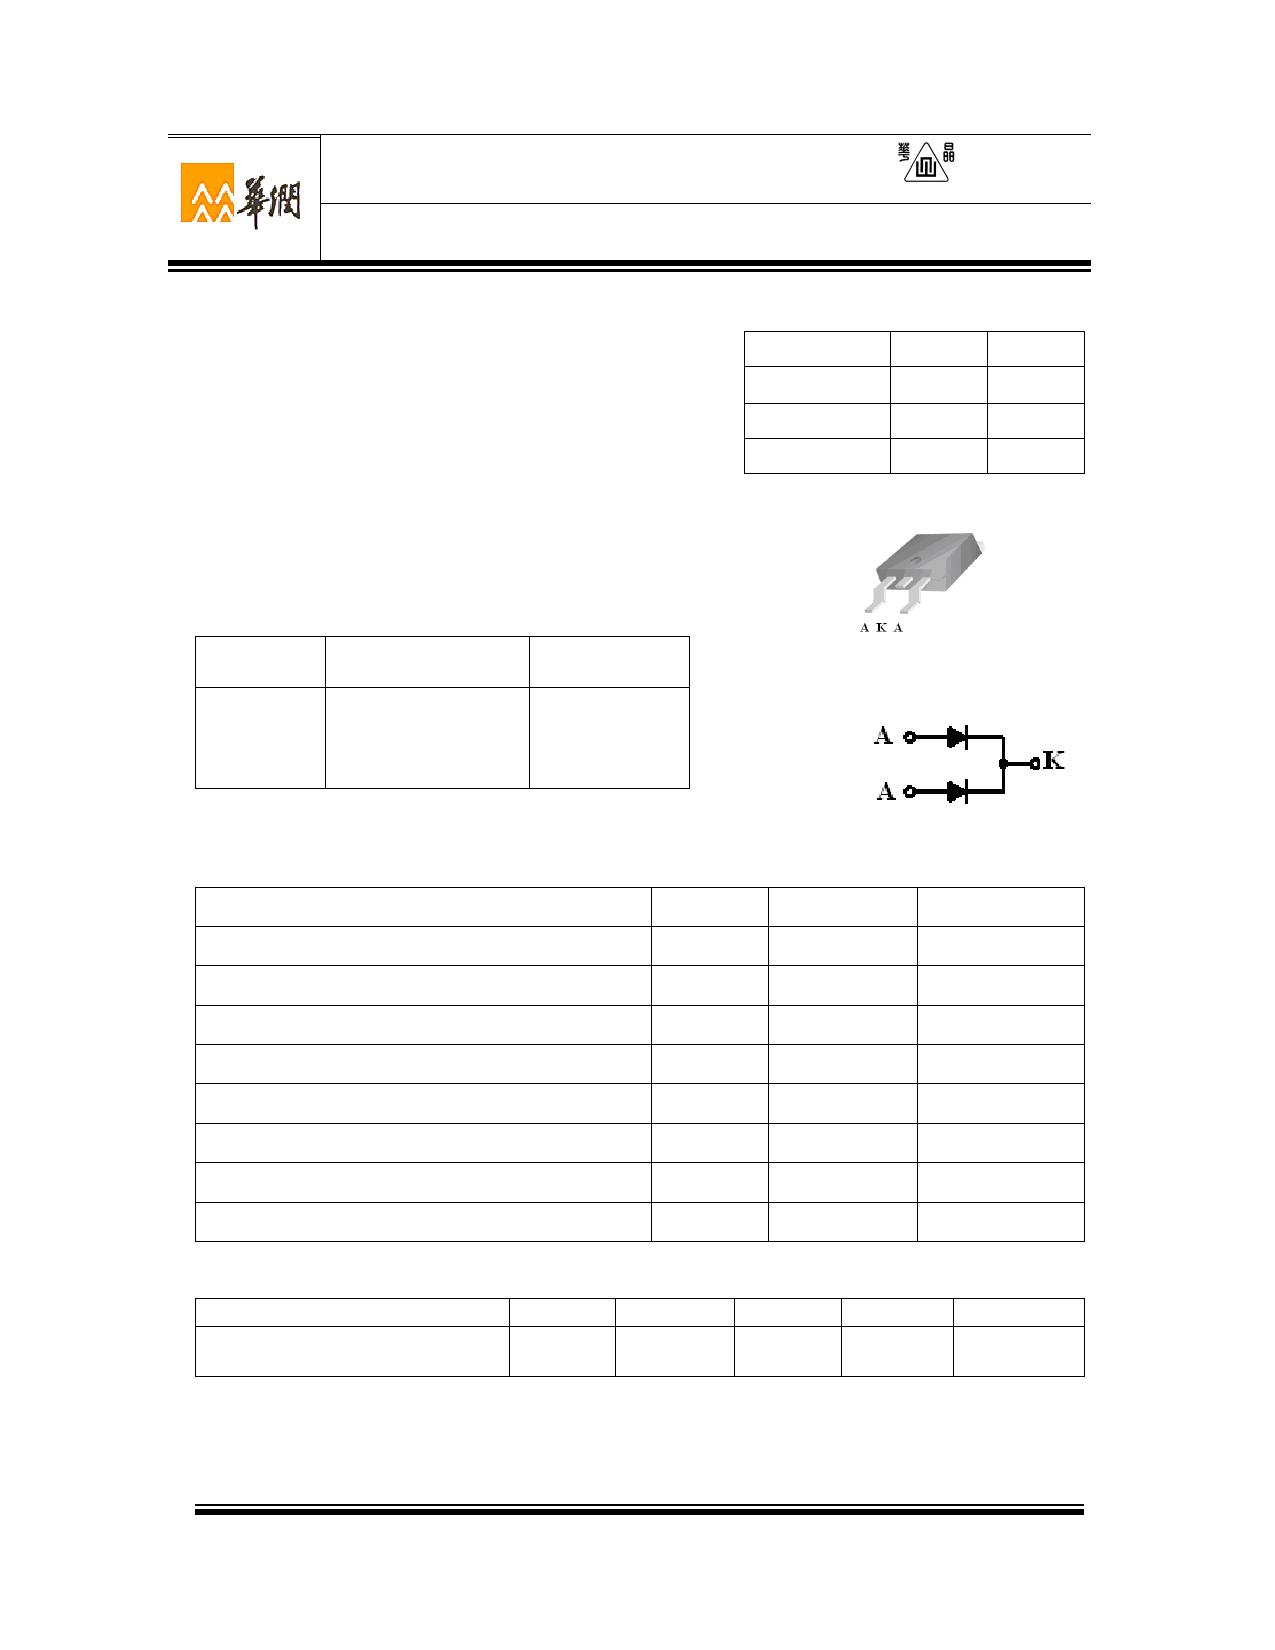 2CZ20100A4S Datasheet, 2CZ20100A4S PDF,ピン配置, 機能